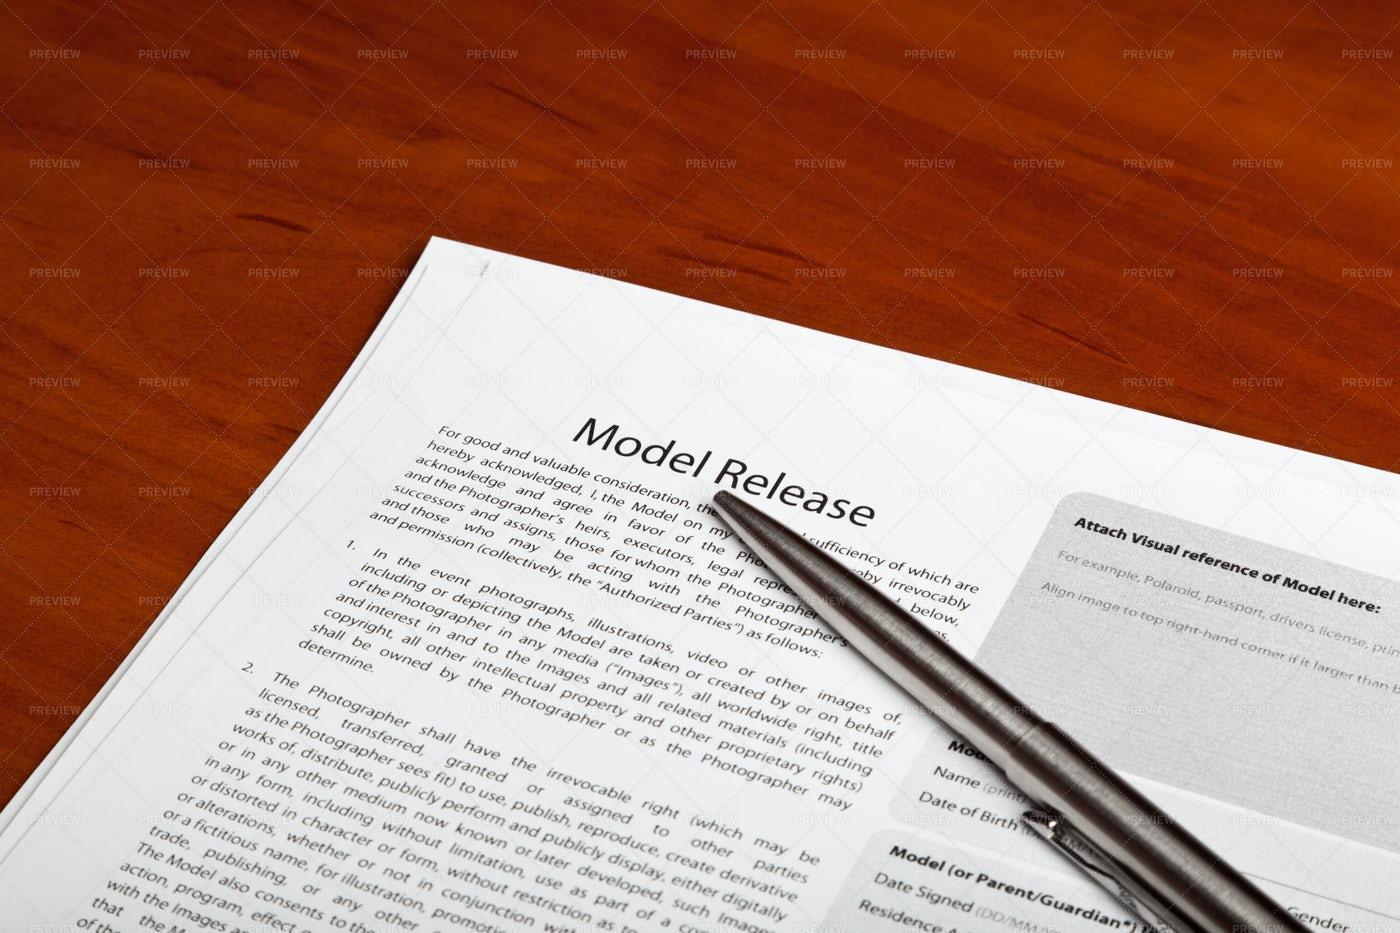 Model Release: Stock Photos